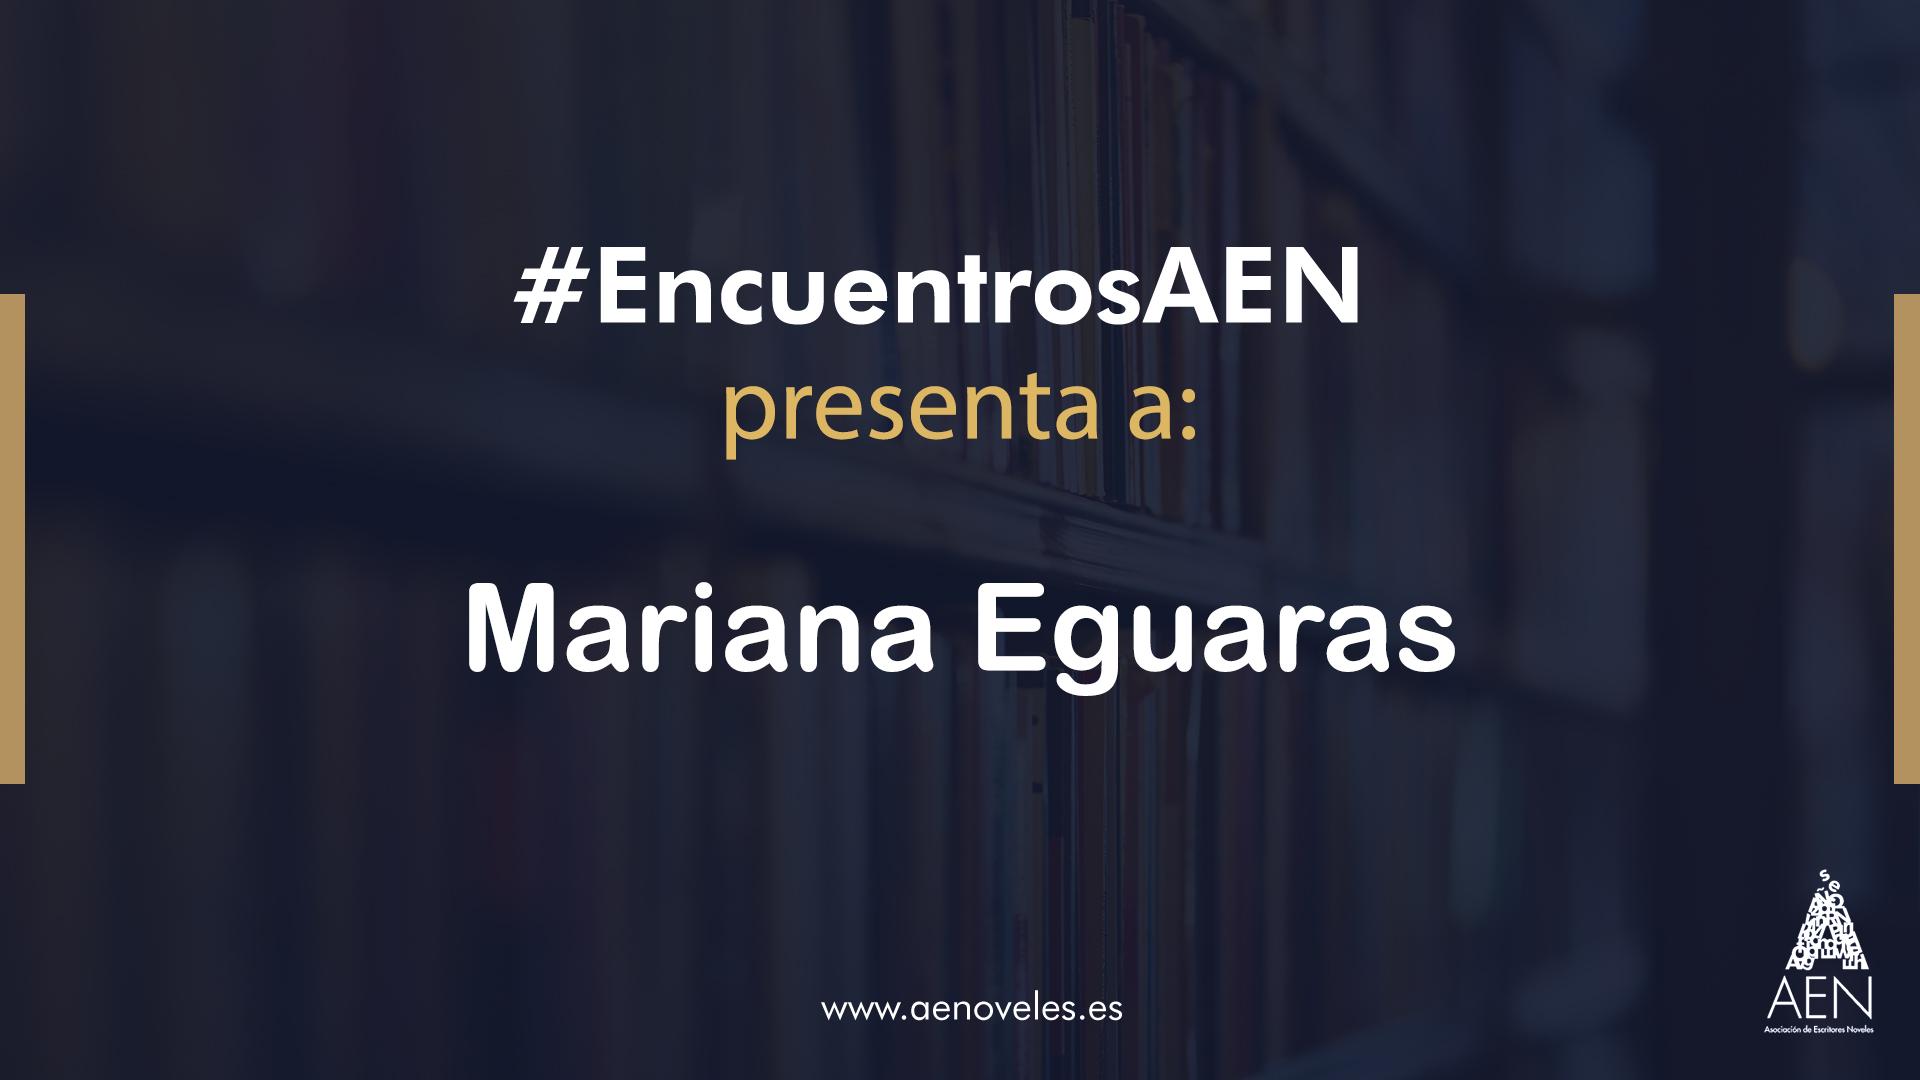 EncuentroAEN con Mariana Eguaras